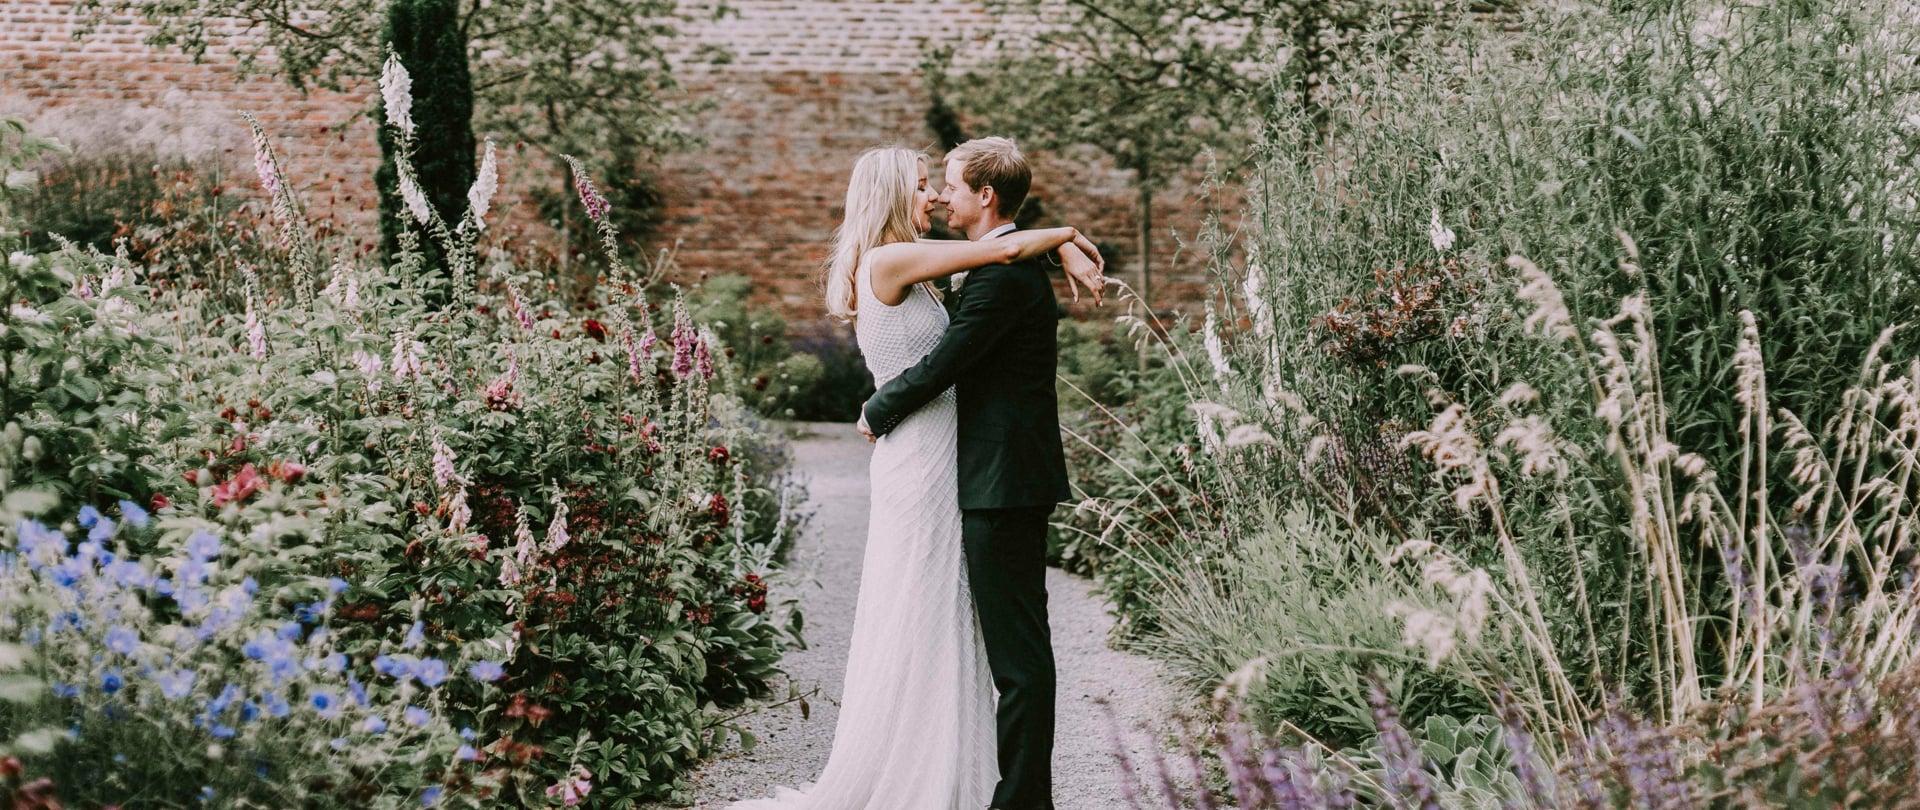 Adelle & Stuart Wedding Video Filmed at North Yorkshire, United Kingdom